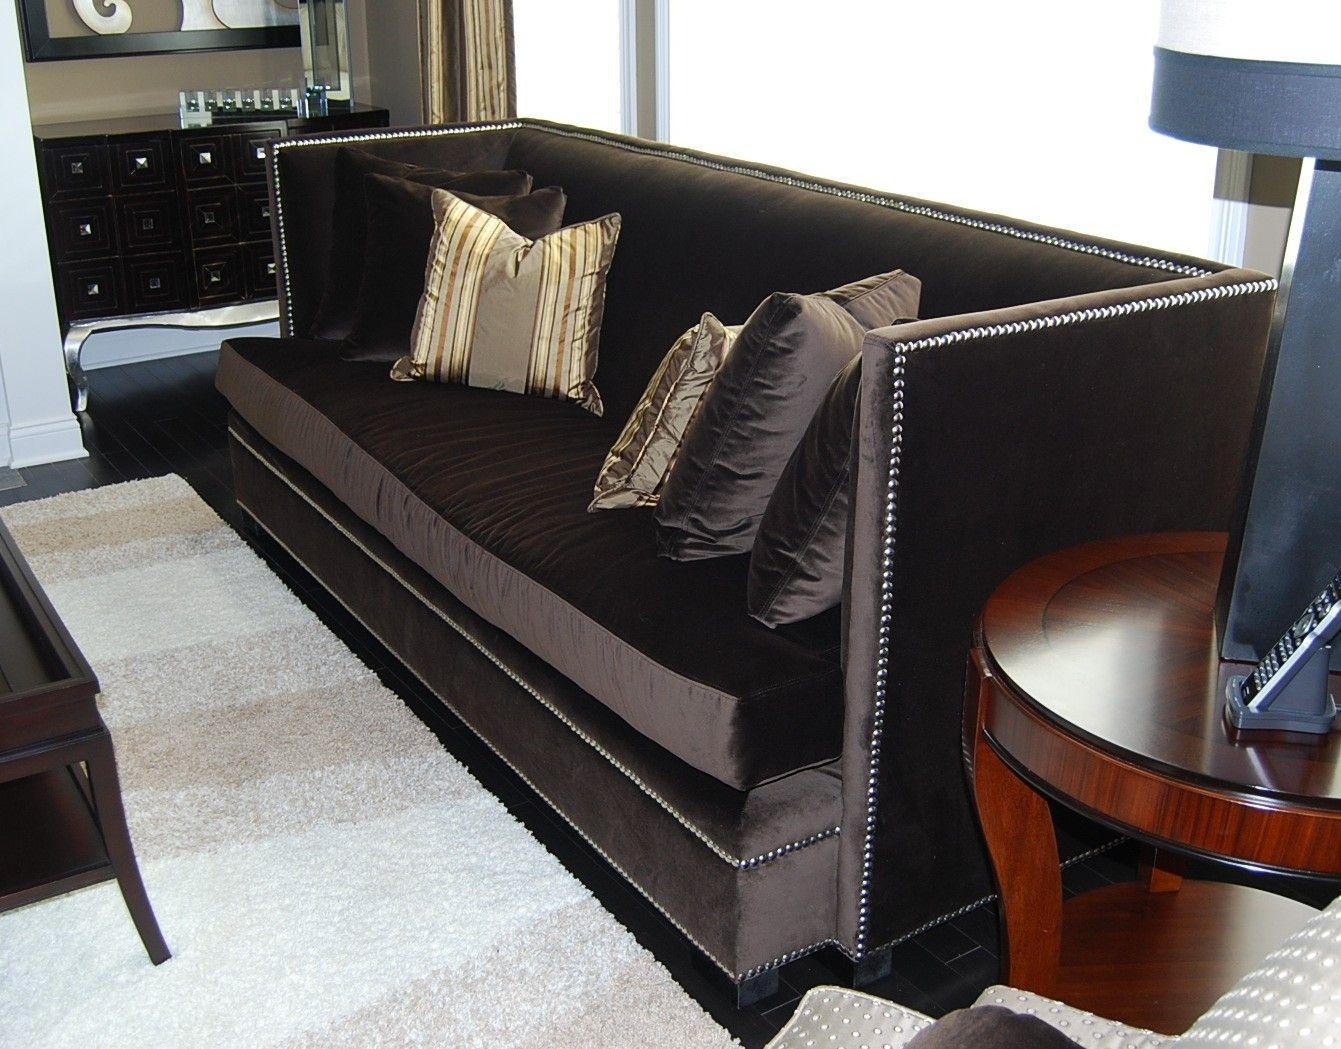 custom shelter arm sofa by access designer decor. Black Bedroom Furniture Sets. Home Design Ideas